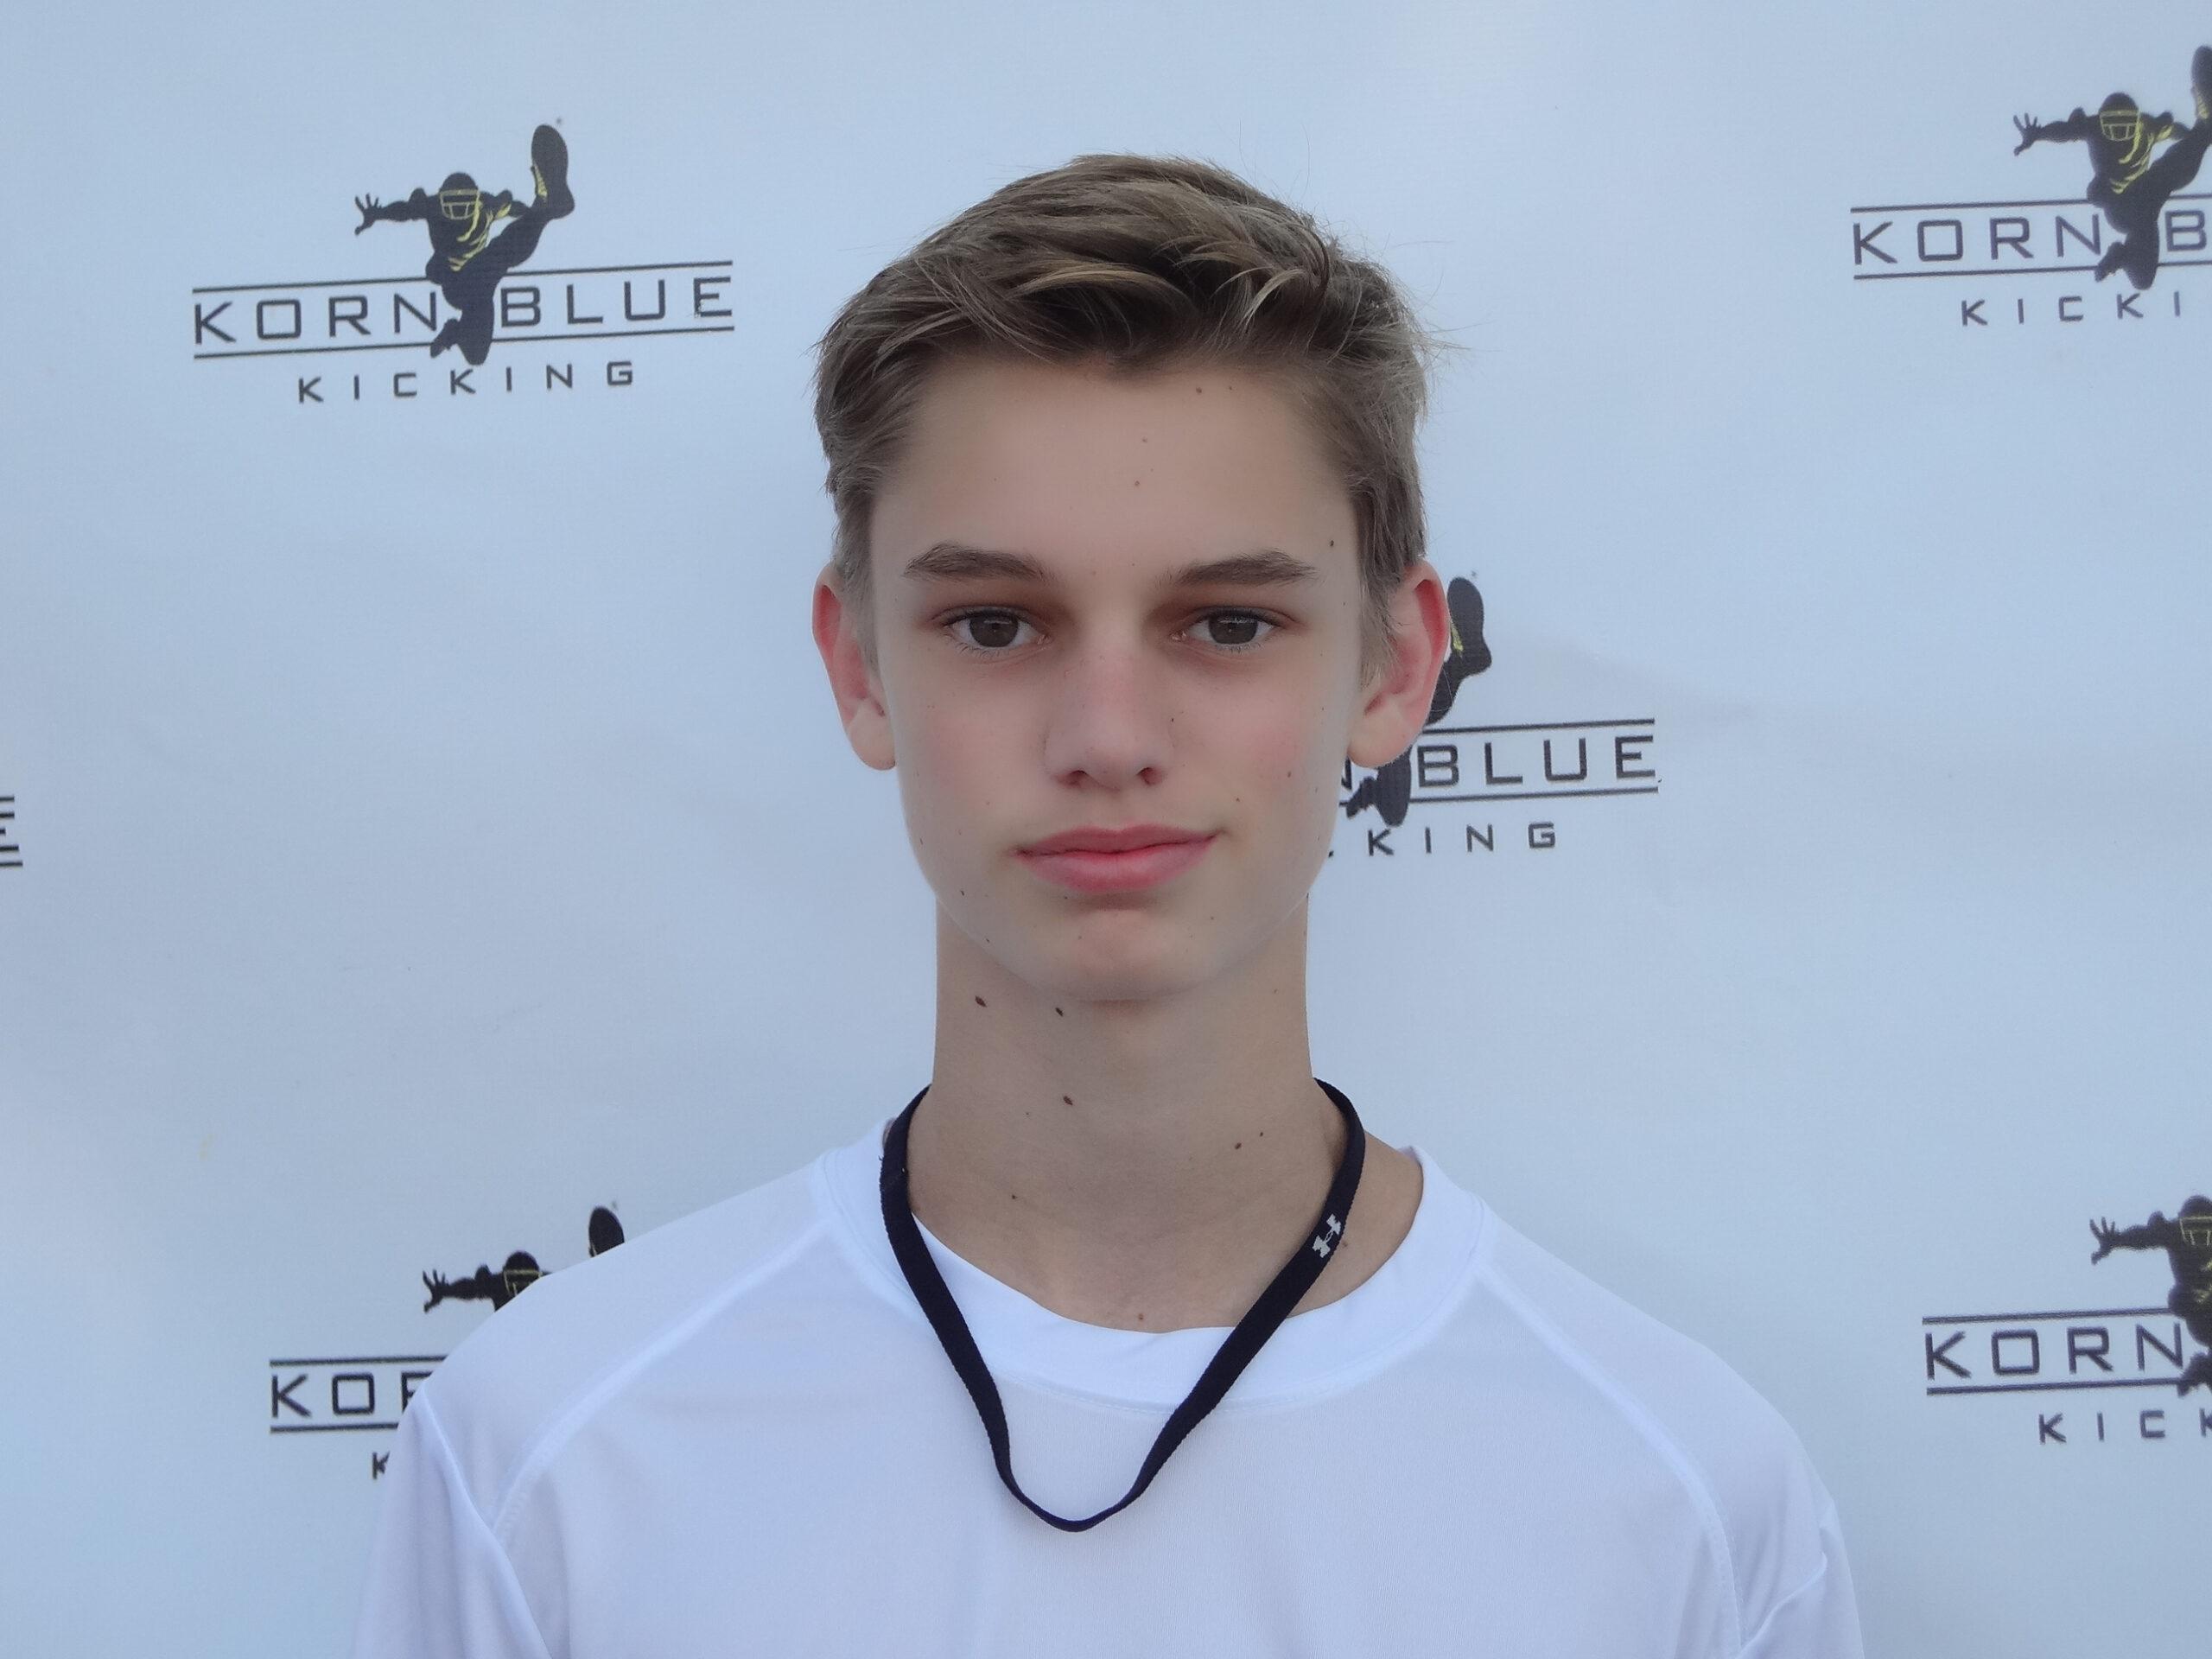 Blake Reid | Kornblue Kicking throughout Hawaii School Calendar 2022 2023